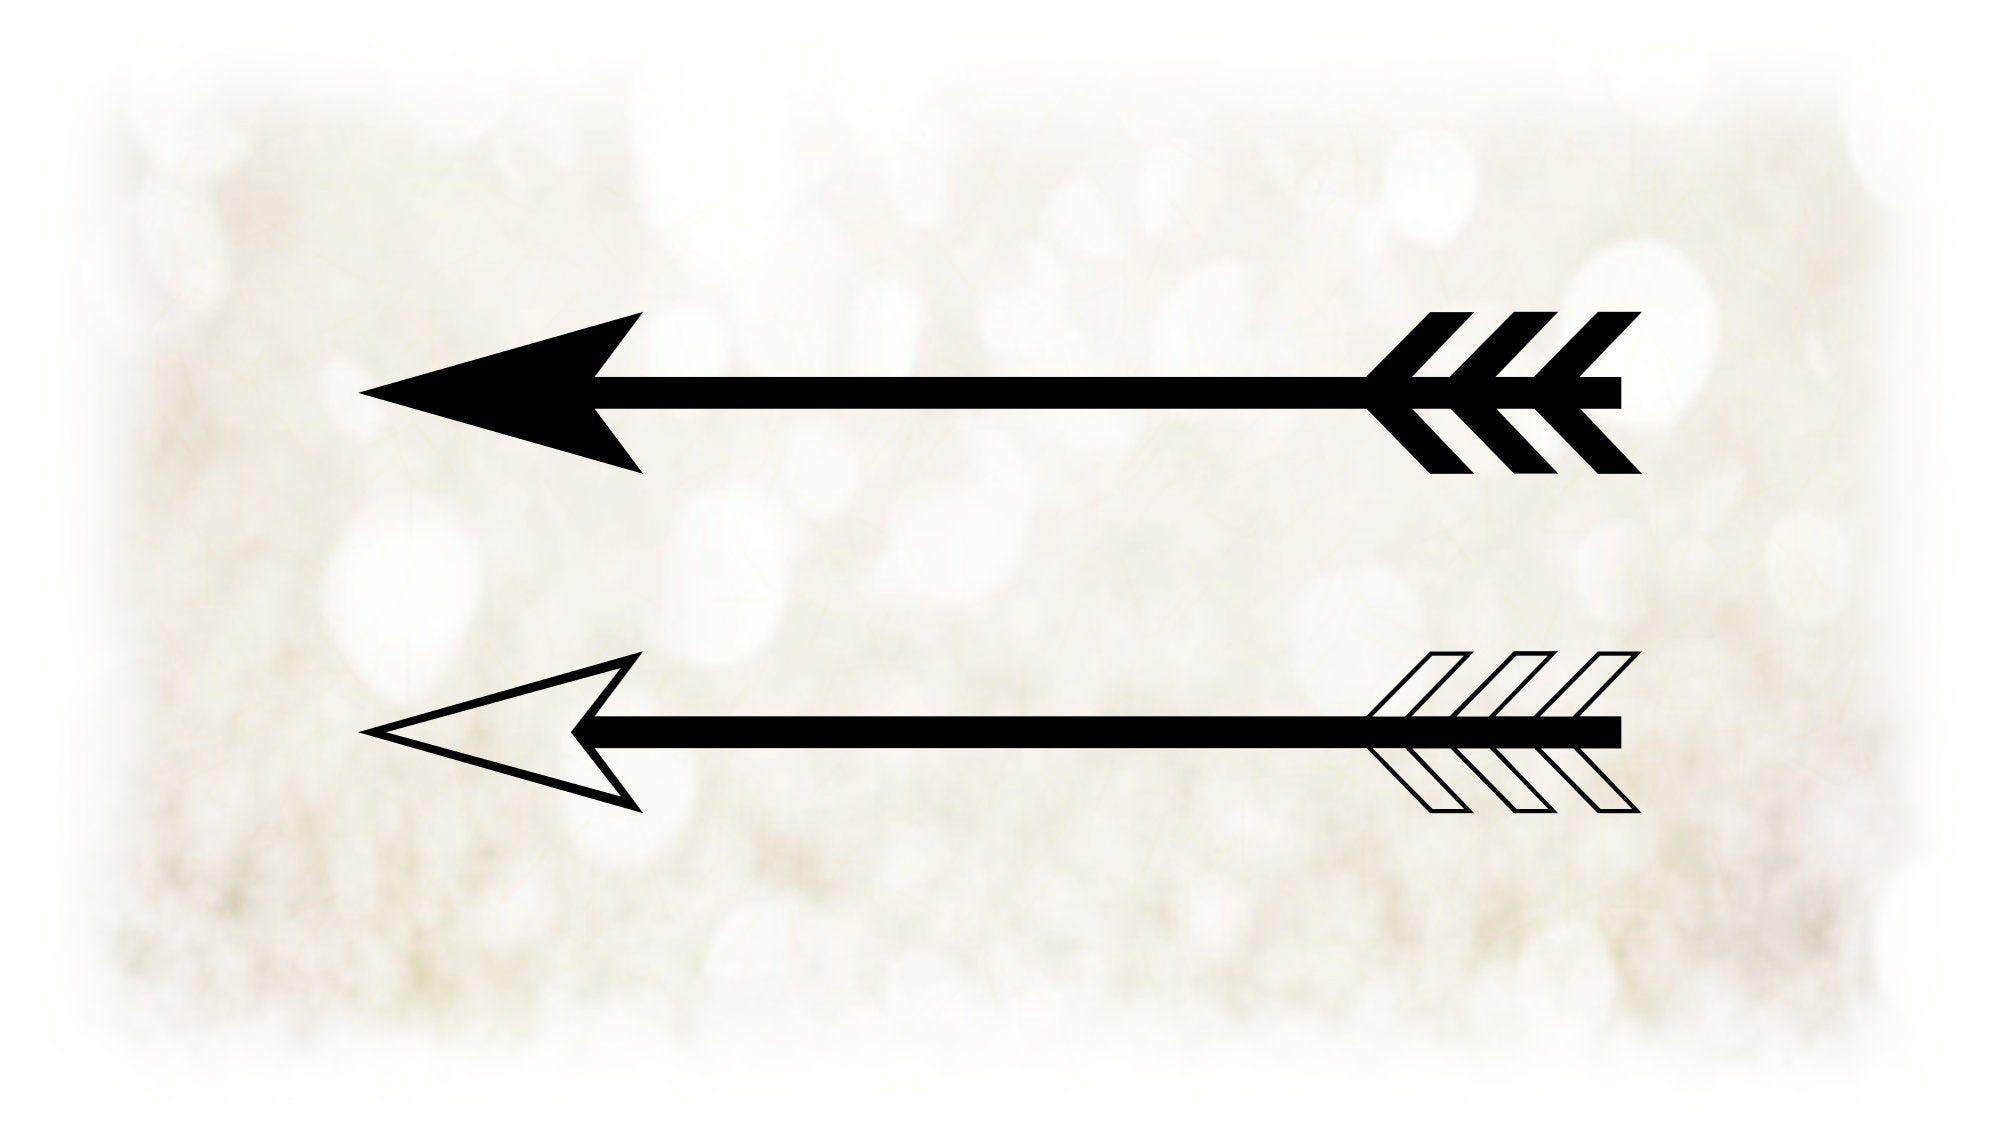 Shape Clipart Large Black White Easy Basic Long Arrows Etsy Clip Art Black And White Large Black